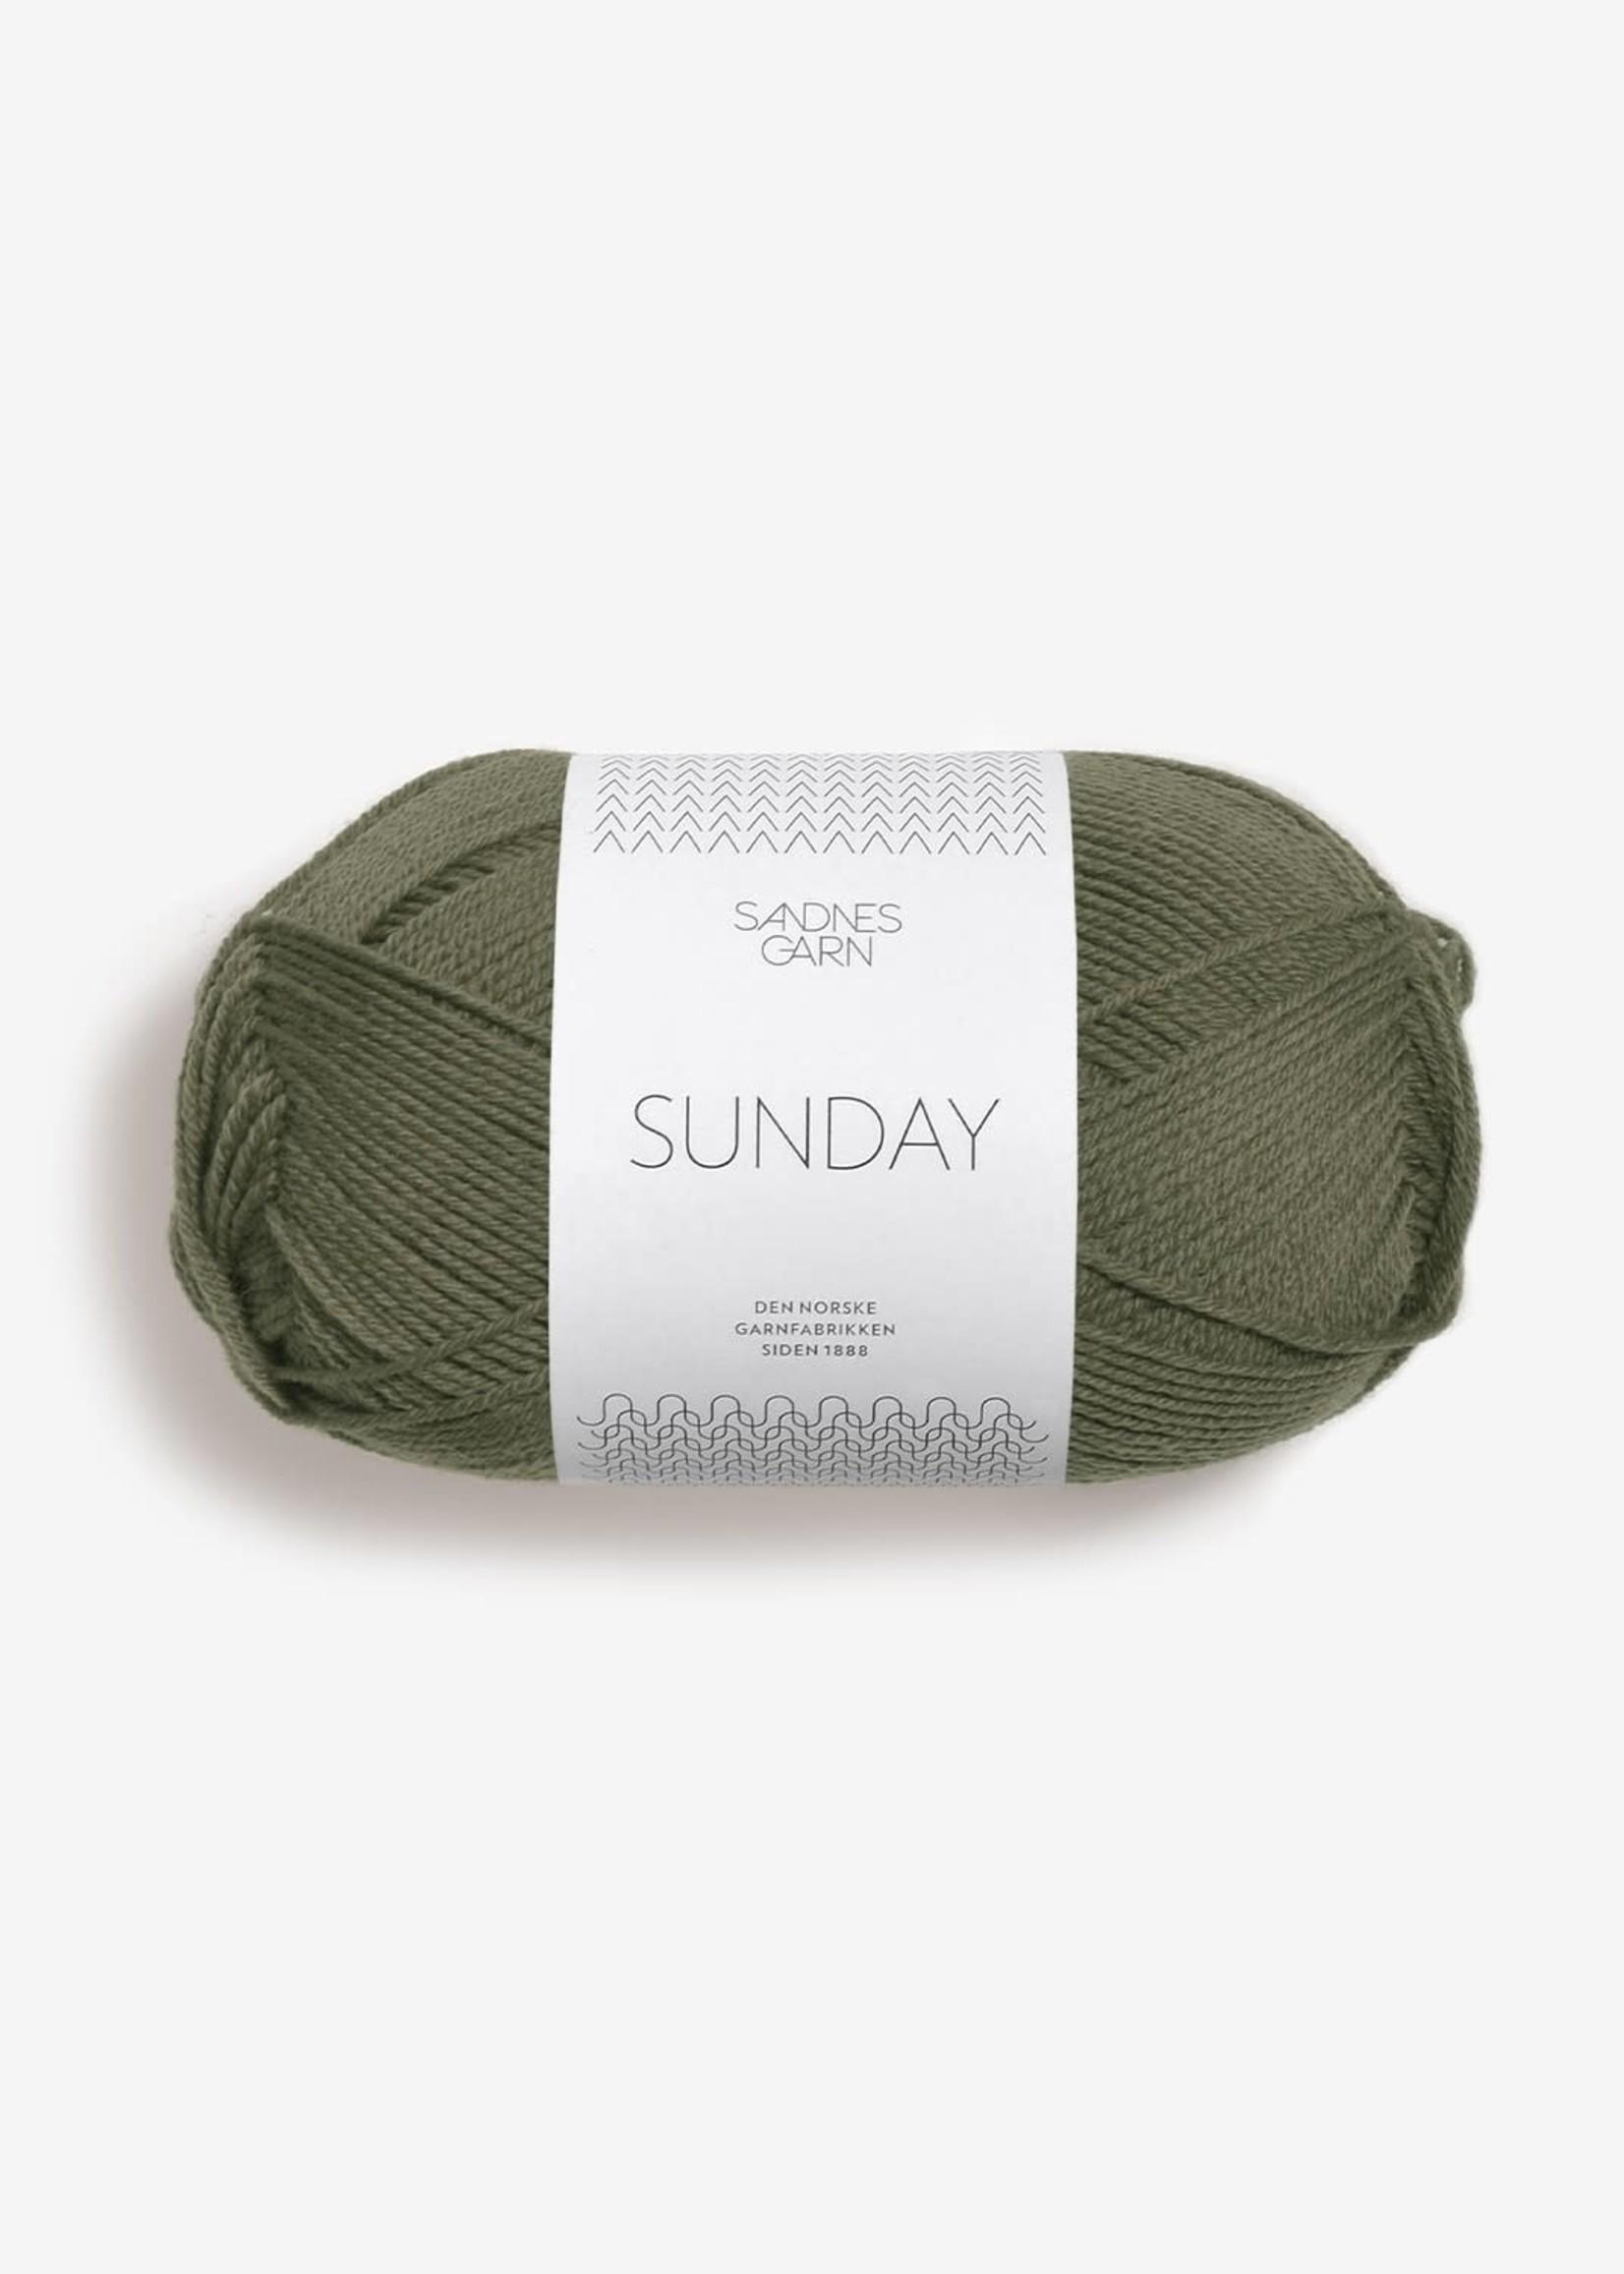 Sandnes Garn Sunday - #9561 Vintermose